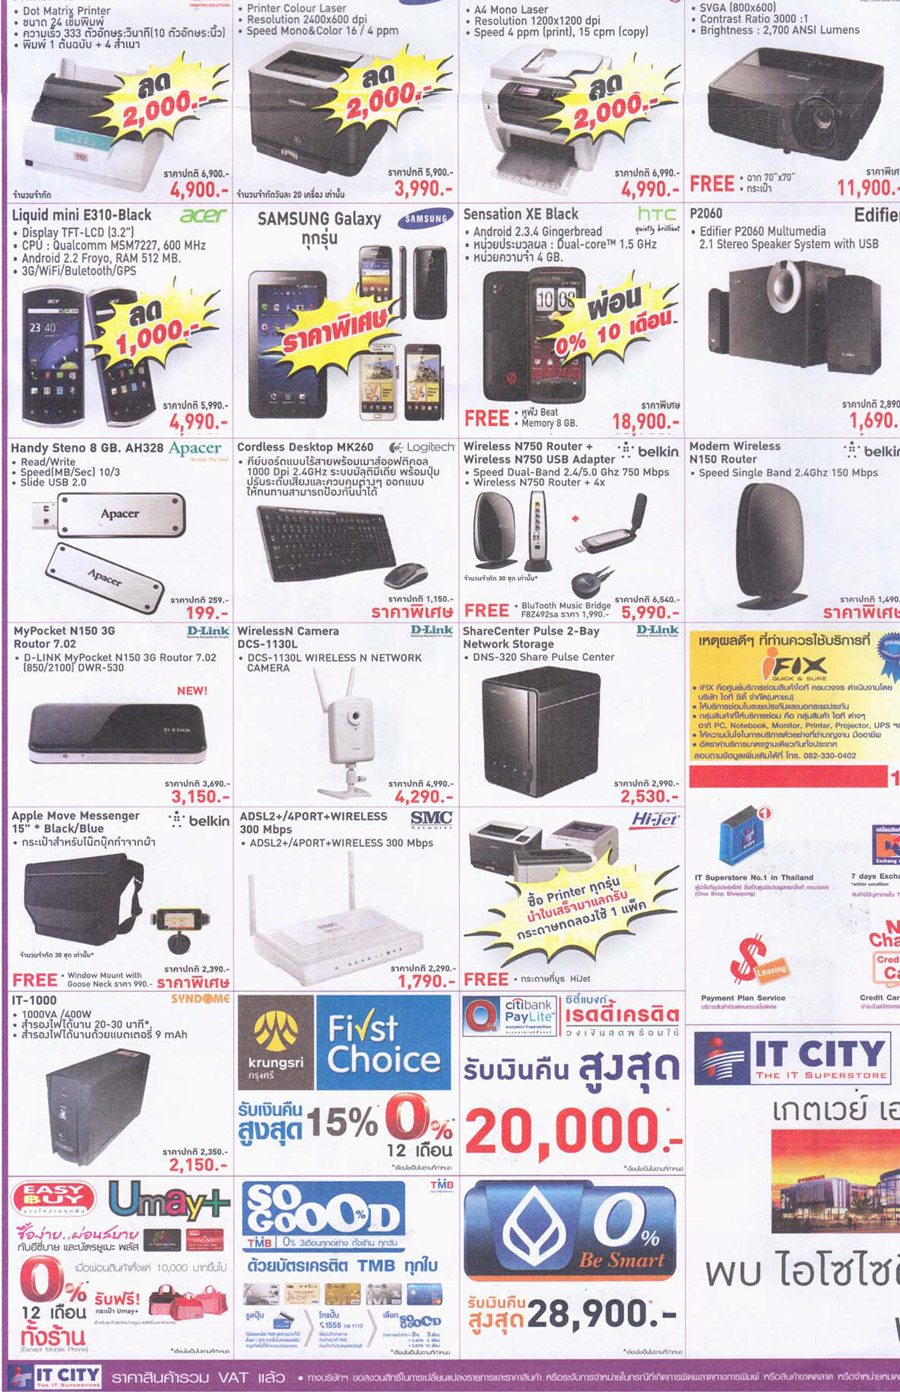 Itcity commart7